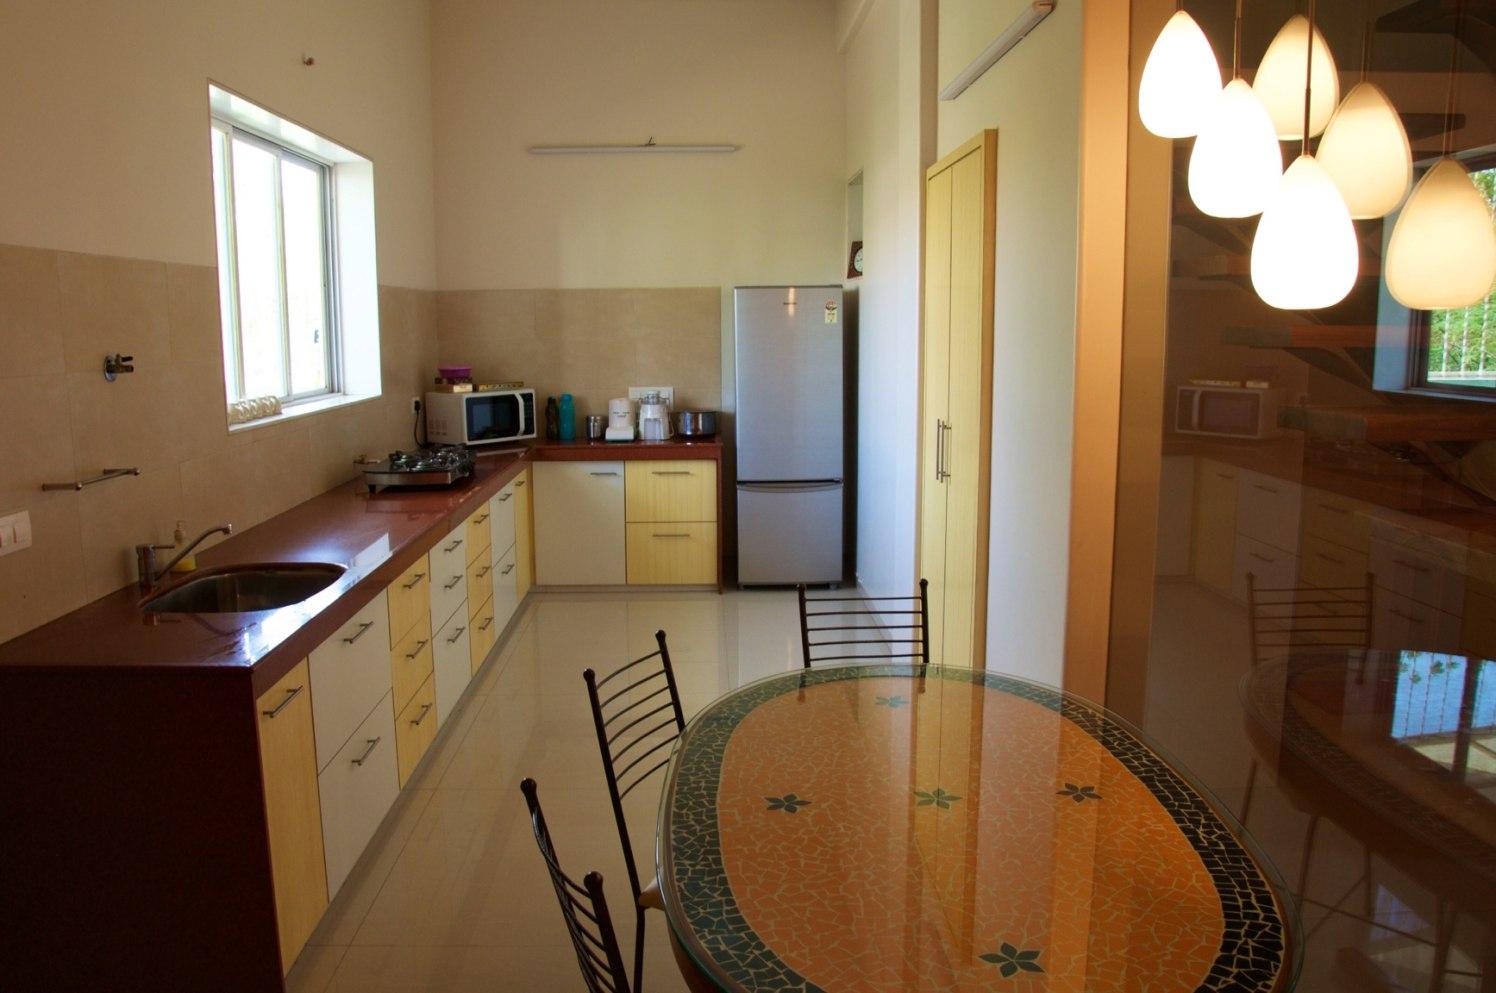 L Shaped Modular Kitchen With Mosaic Art Dining Table by Viraf Laskari  Modular-kitchen Modern | Interior Design Photos & Ideas